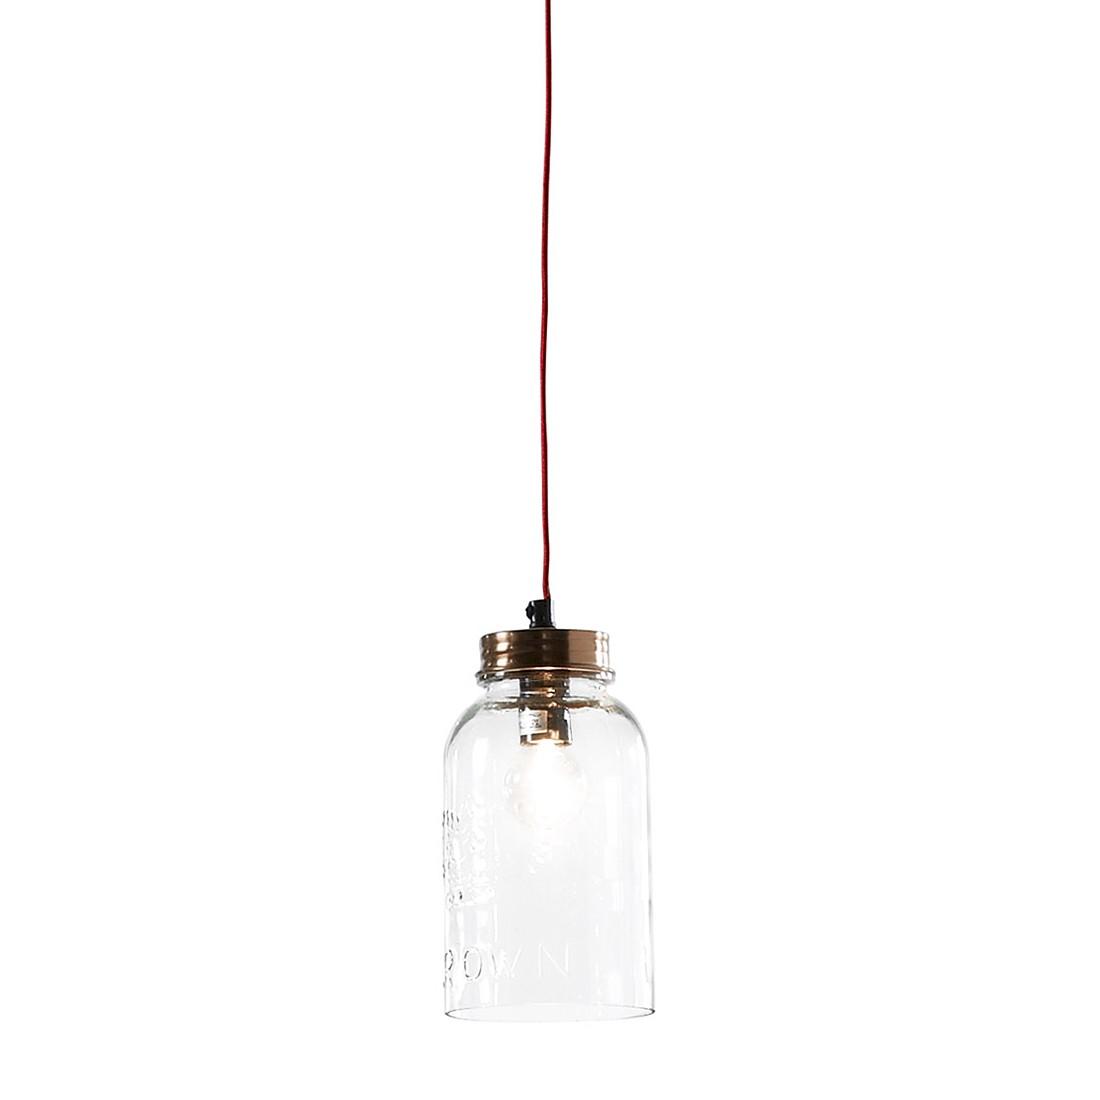 pendelleuchte crow by juli metall glas 1 flammig julia. Black Bedroom Furniture Sets. Home Design Ideas